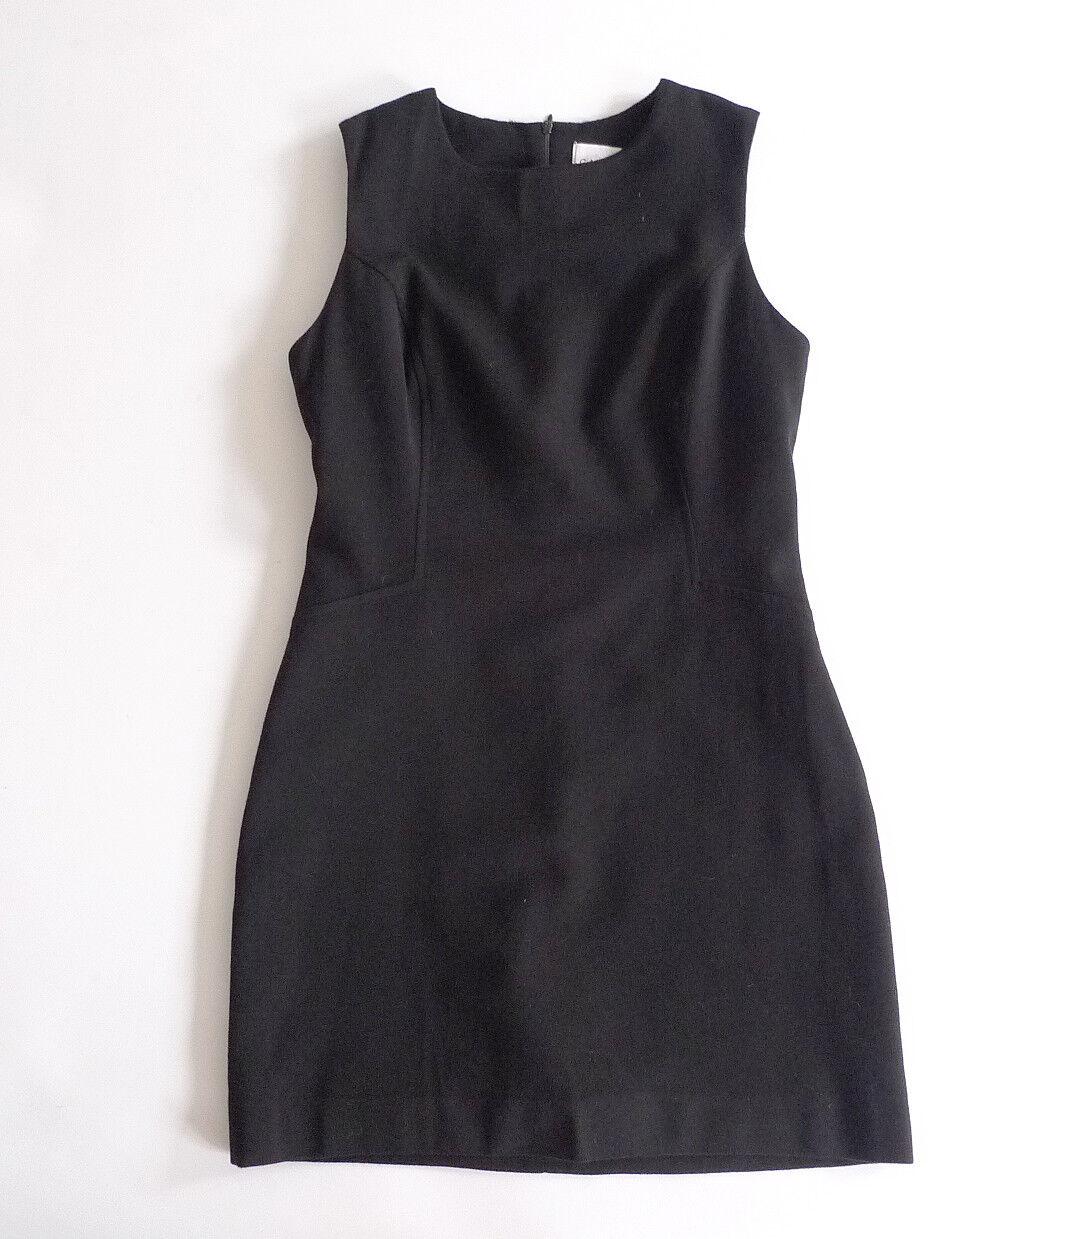 PETITE ROBE blackE CAROLL size FR